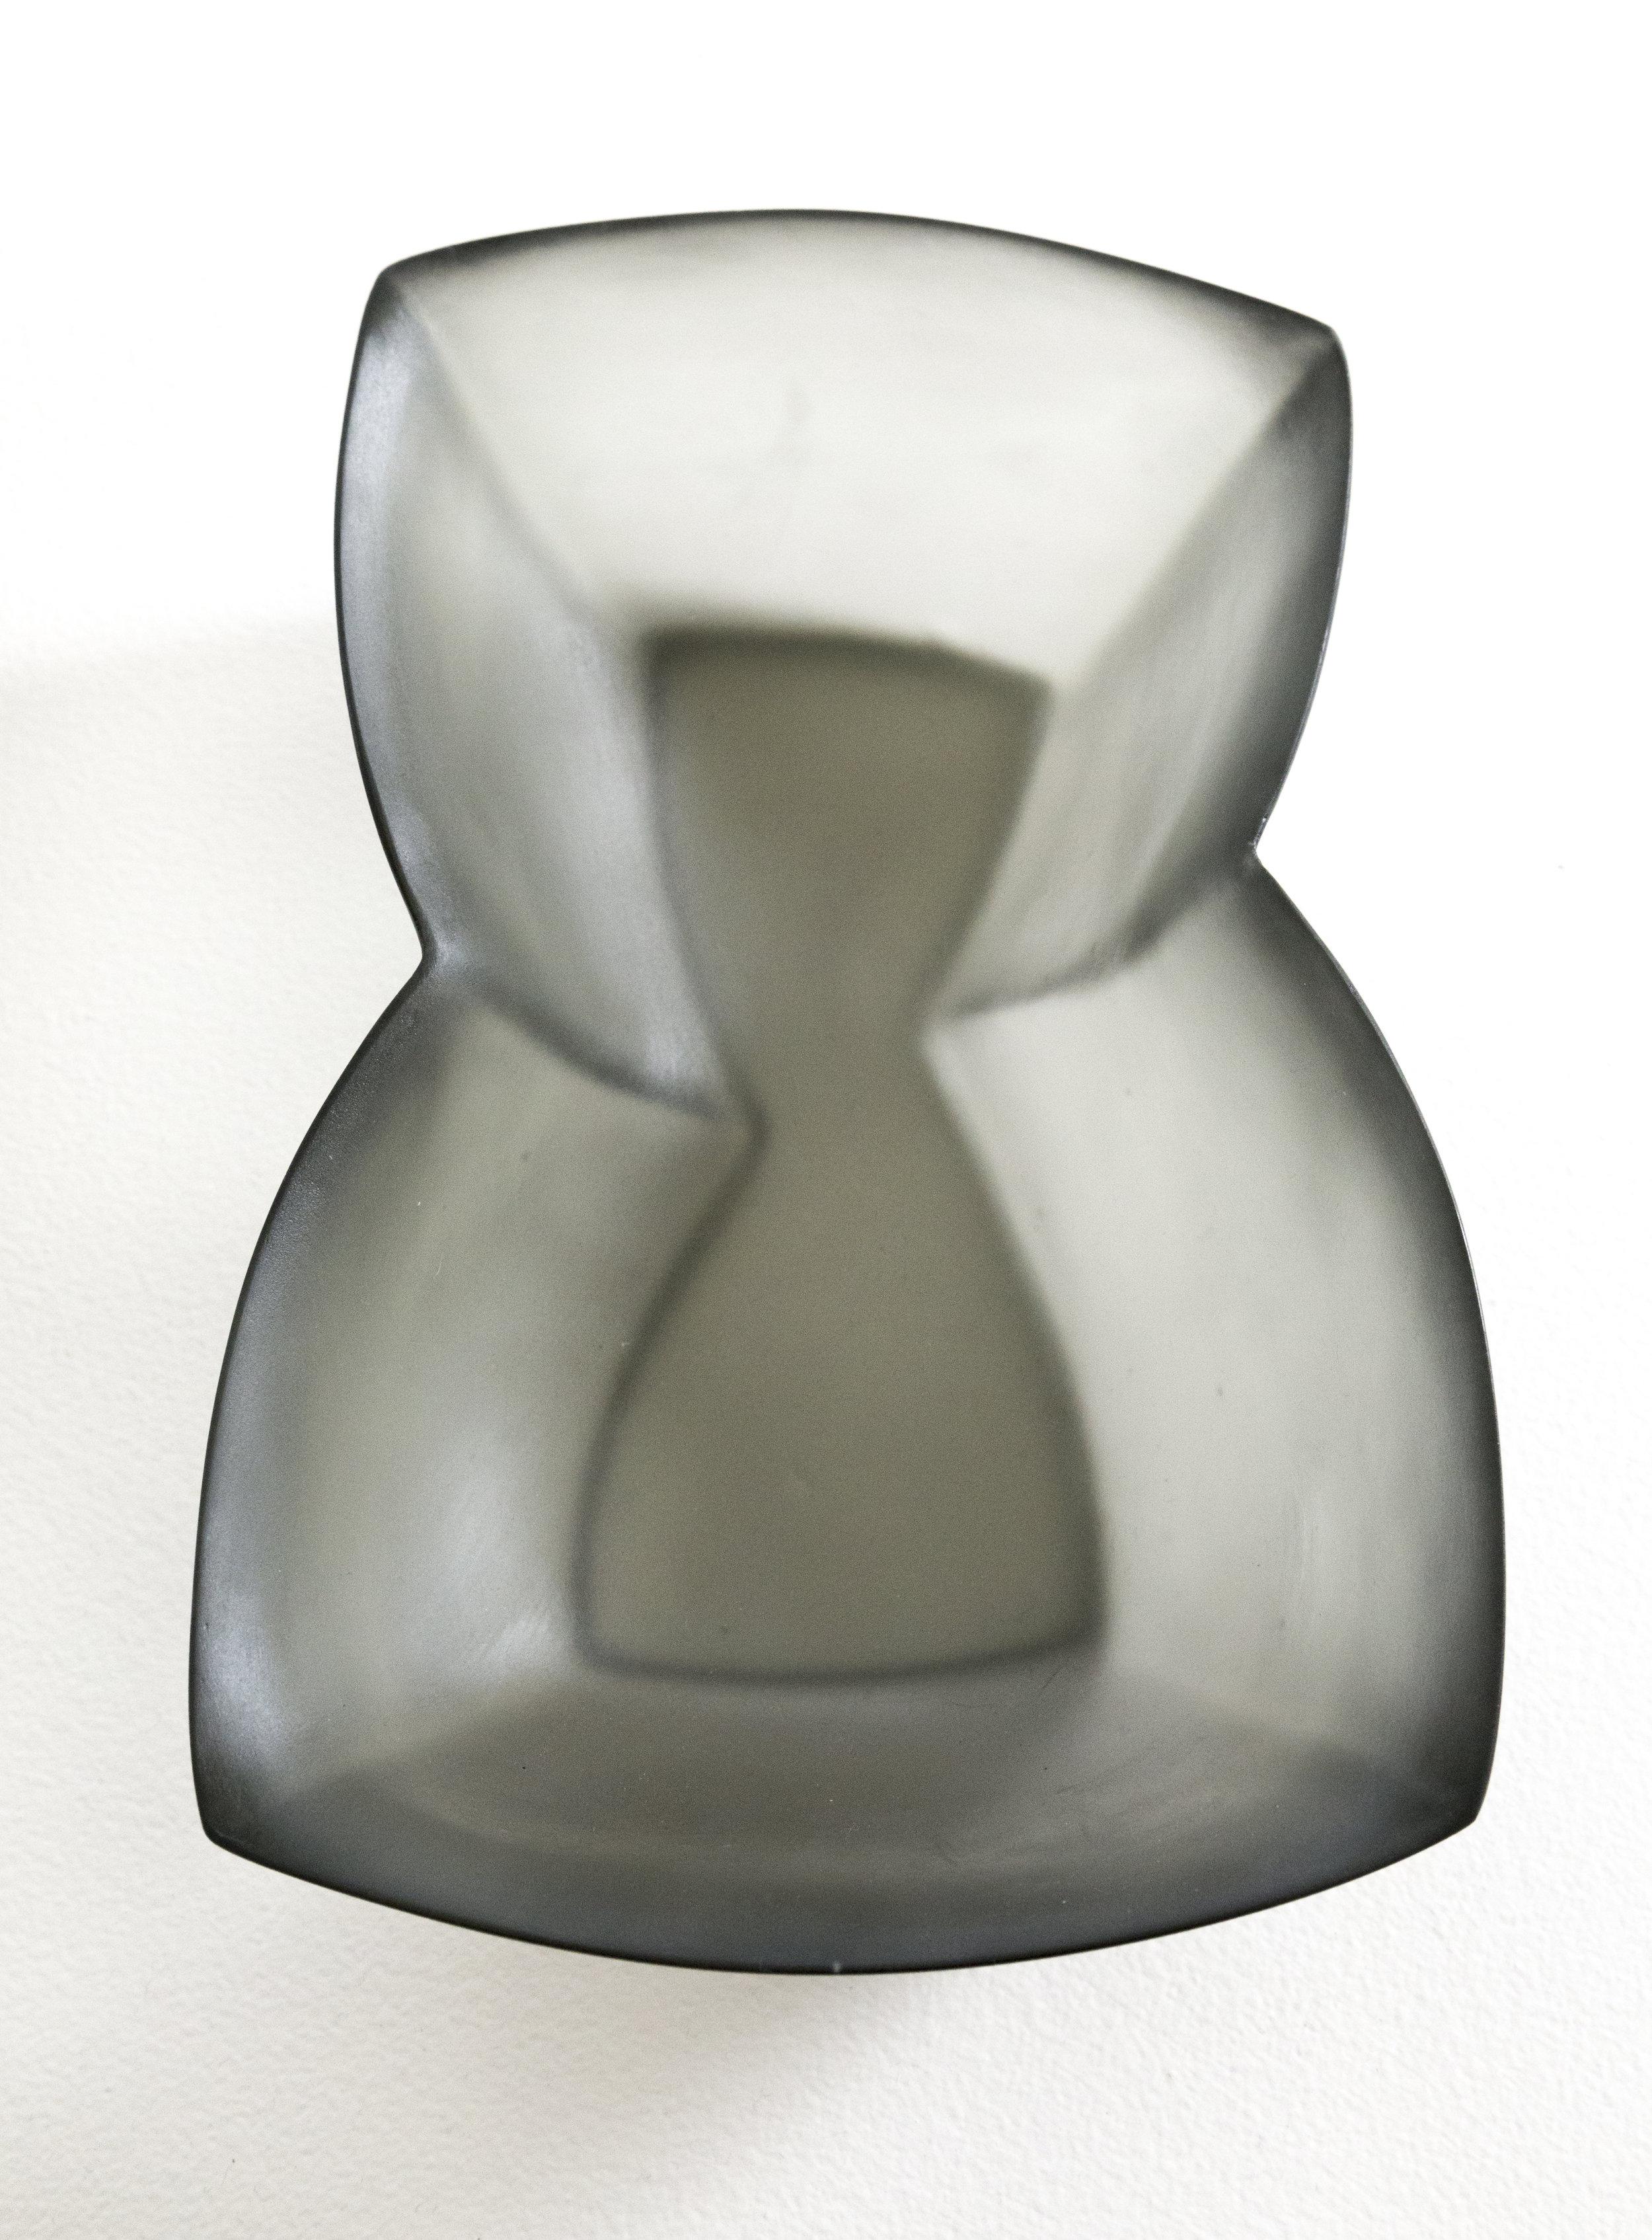 cast glass 2017